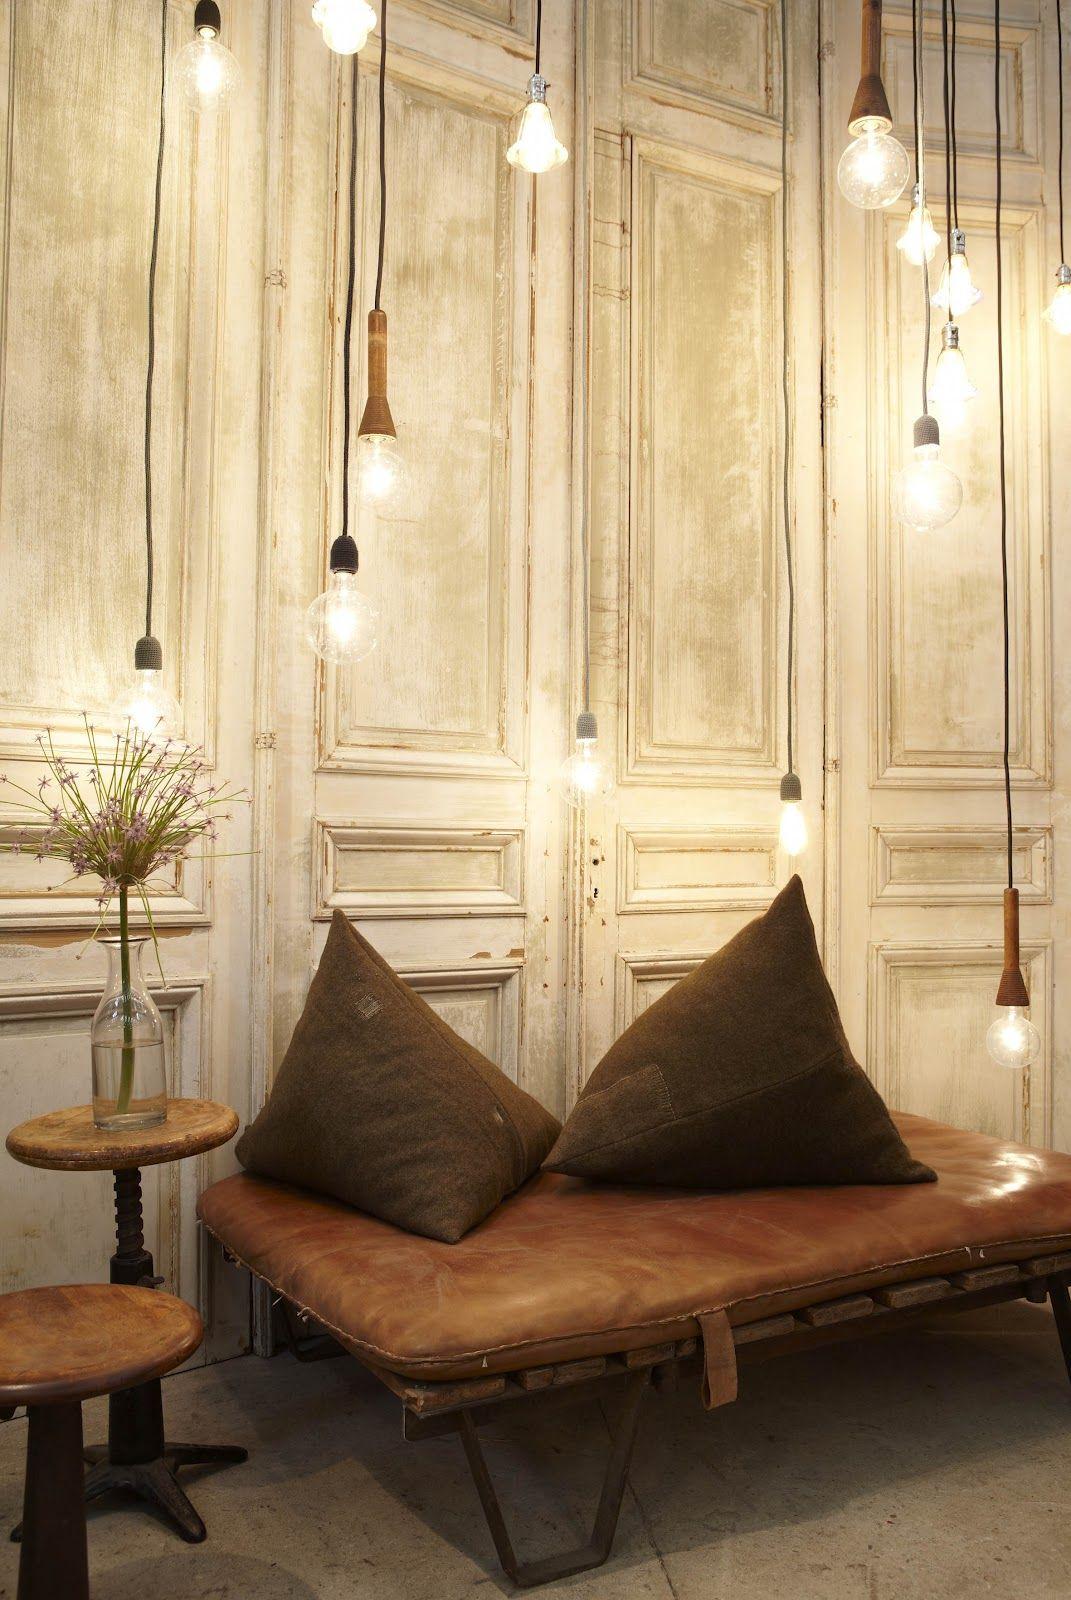 LE PRINTEMPS DE NORD-OUEST   Wood walls, Interior lighting and Interiors